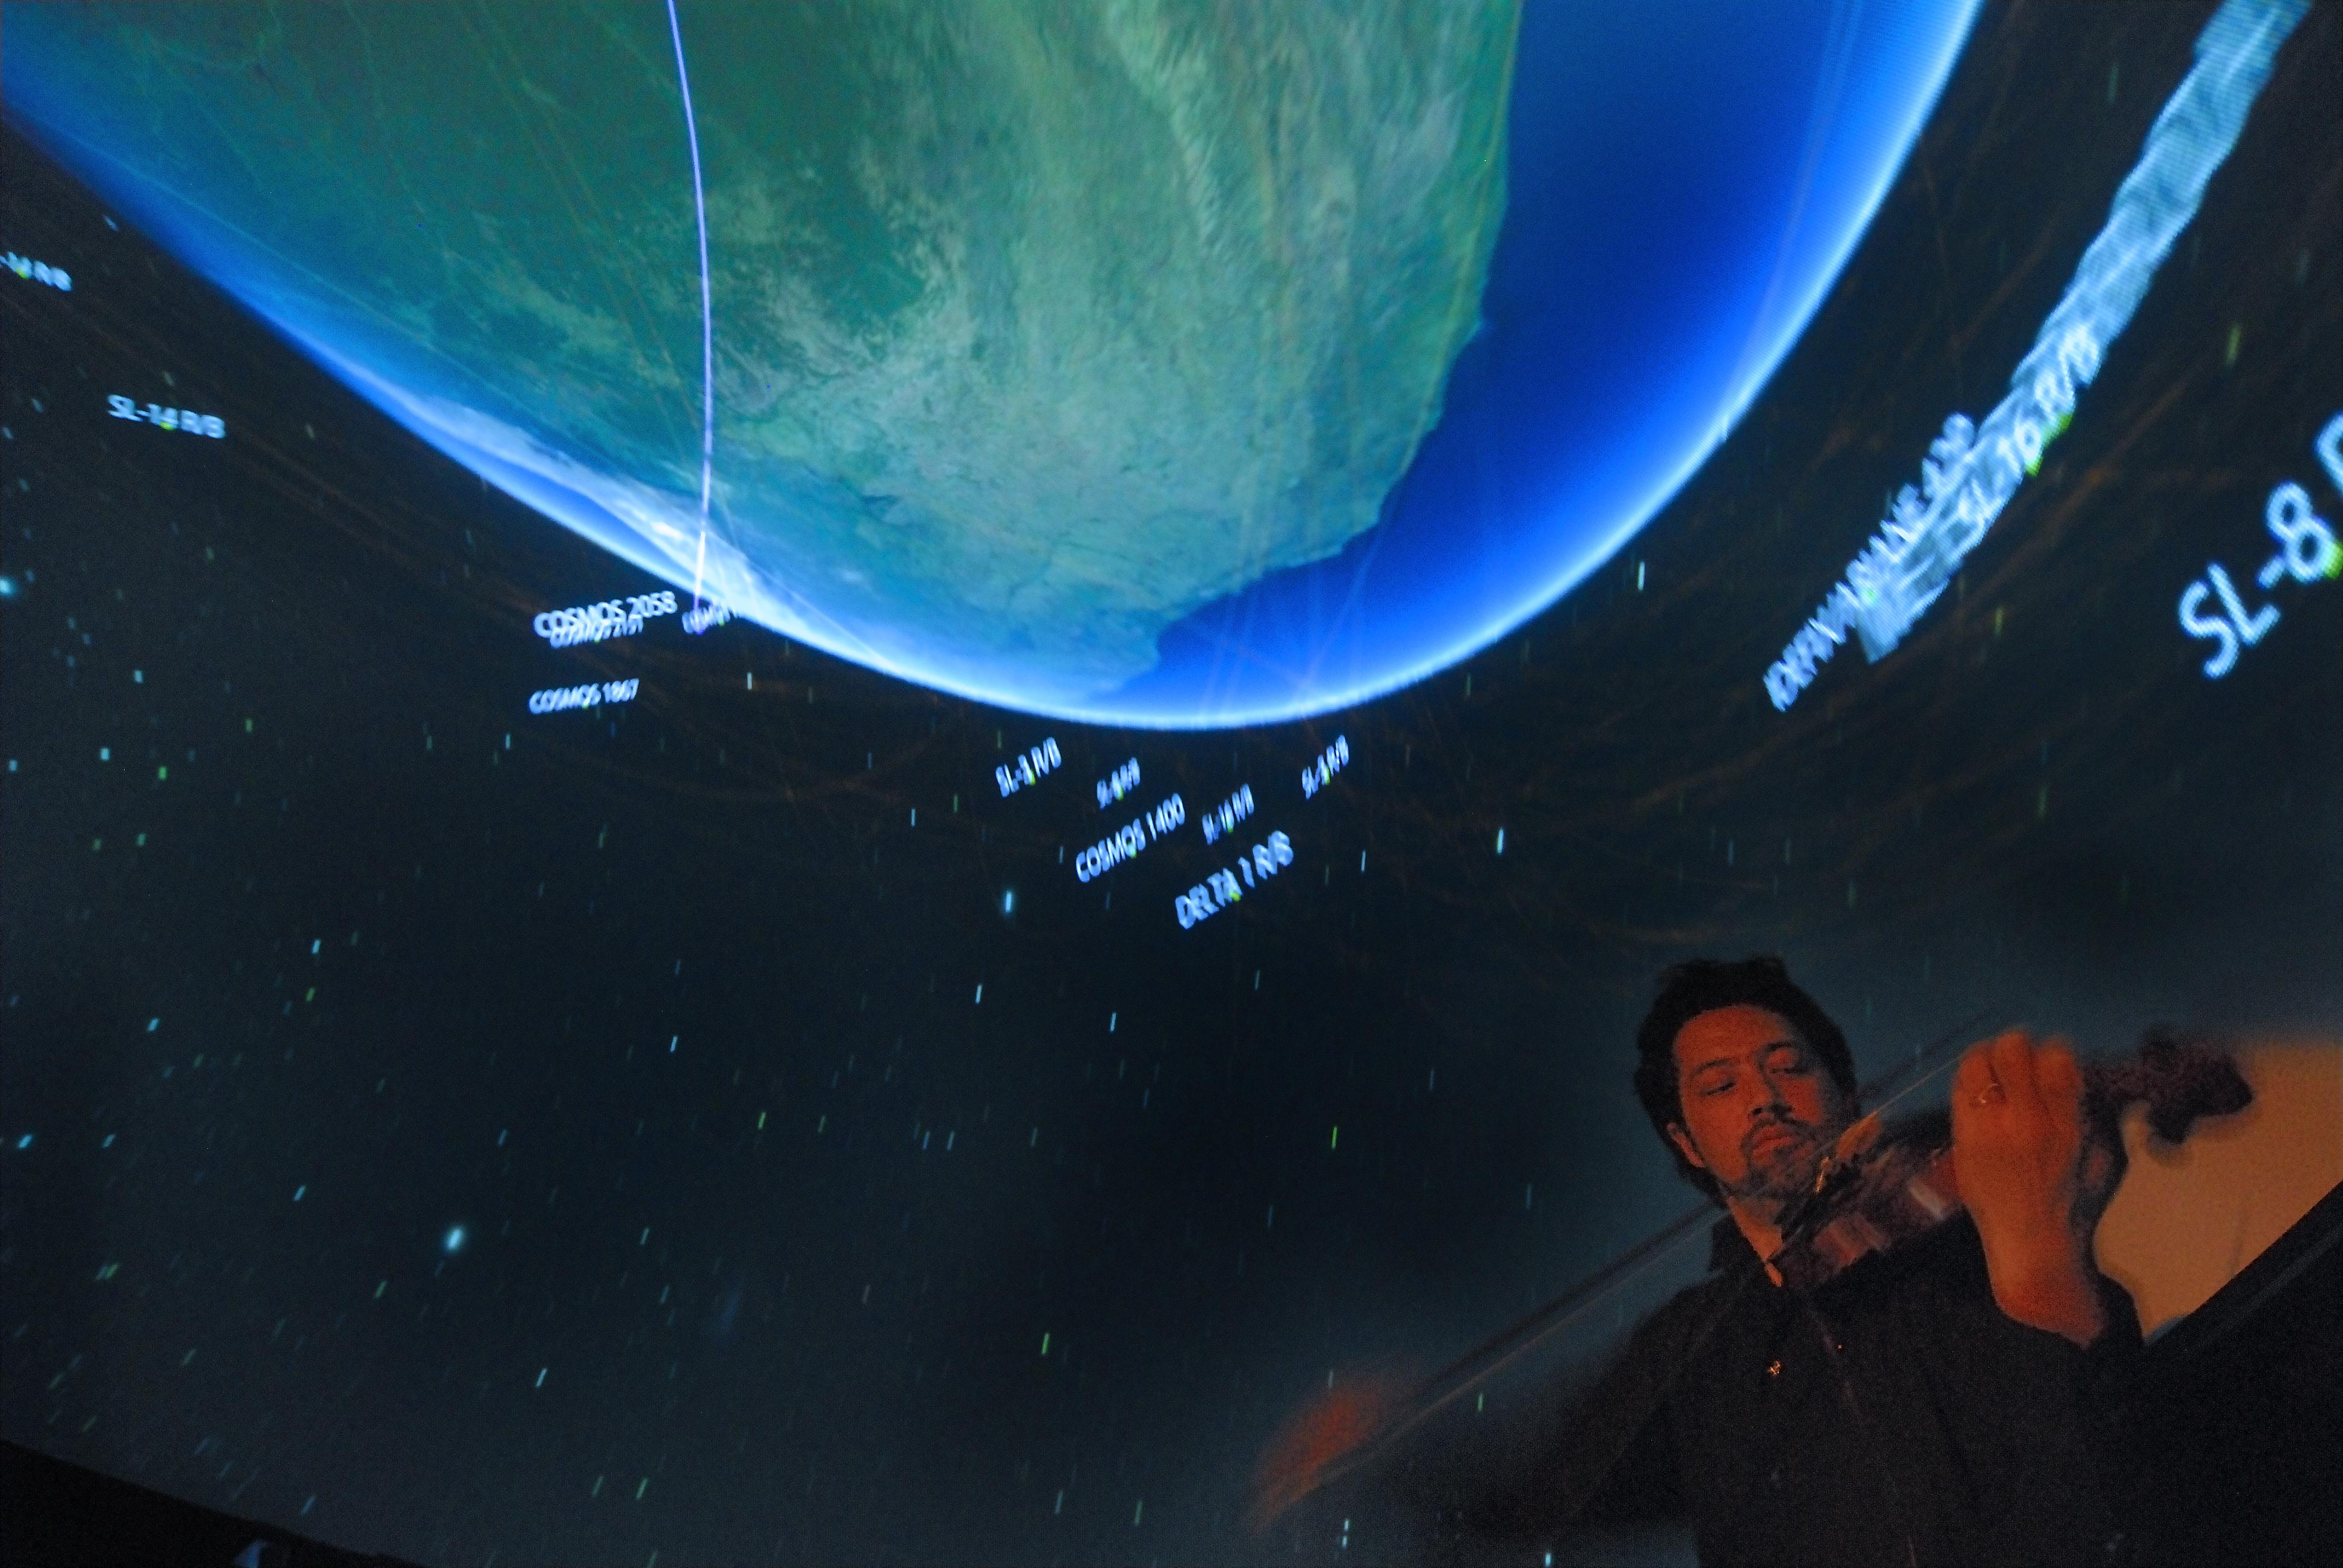 NASA - 'Beautiful Earth' Combines Live Music, American